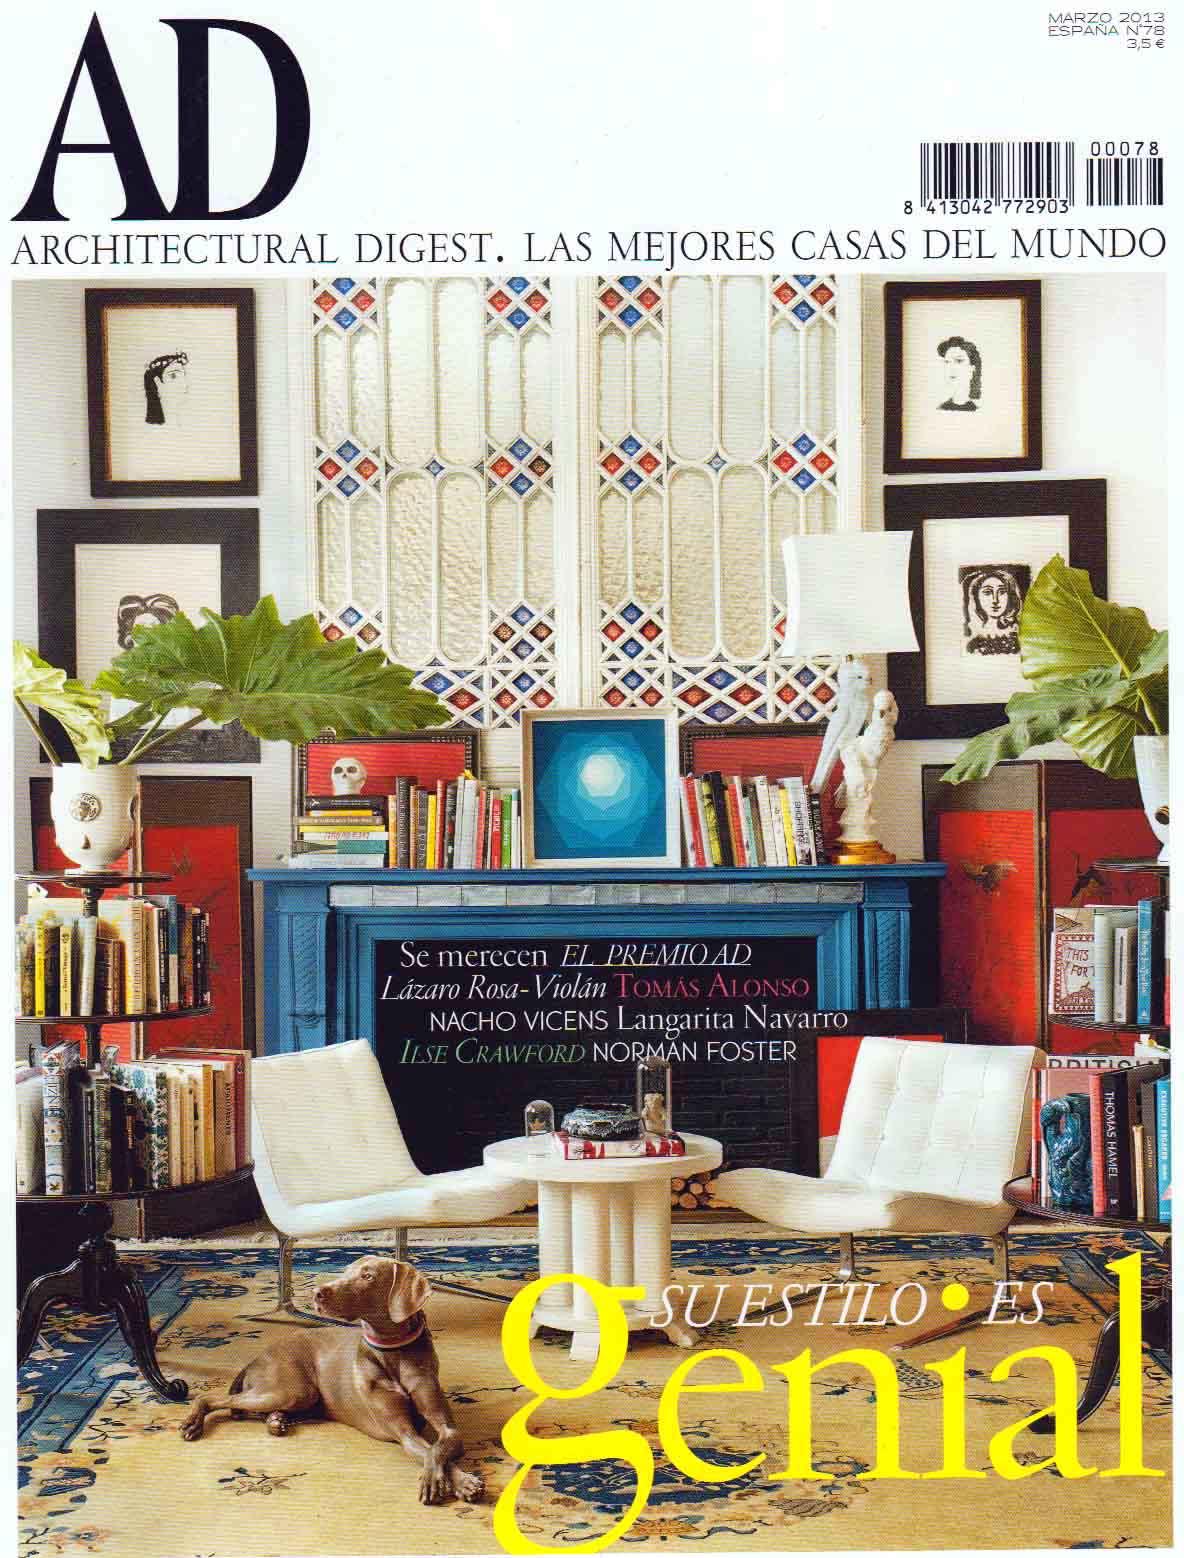 revista-ad-marzo-2013-melian_randolph-portada-0